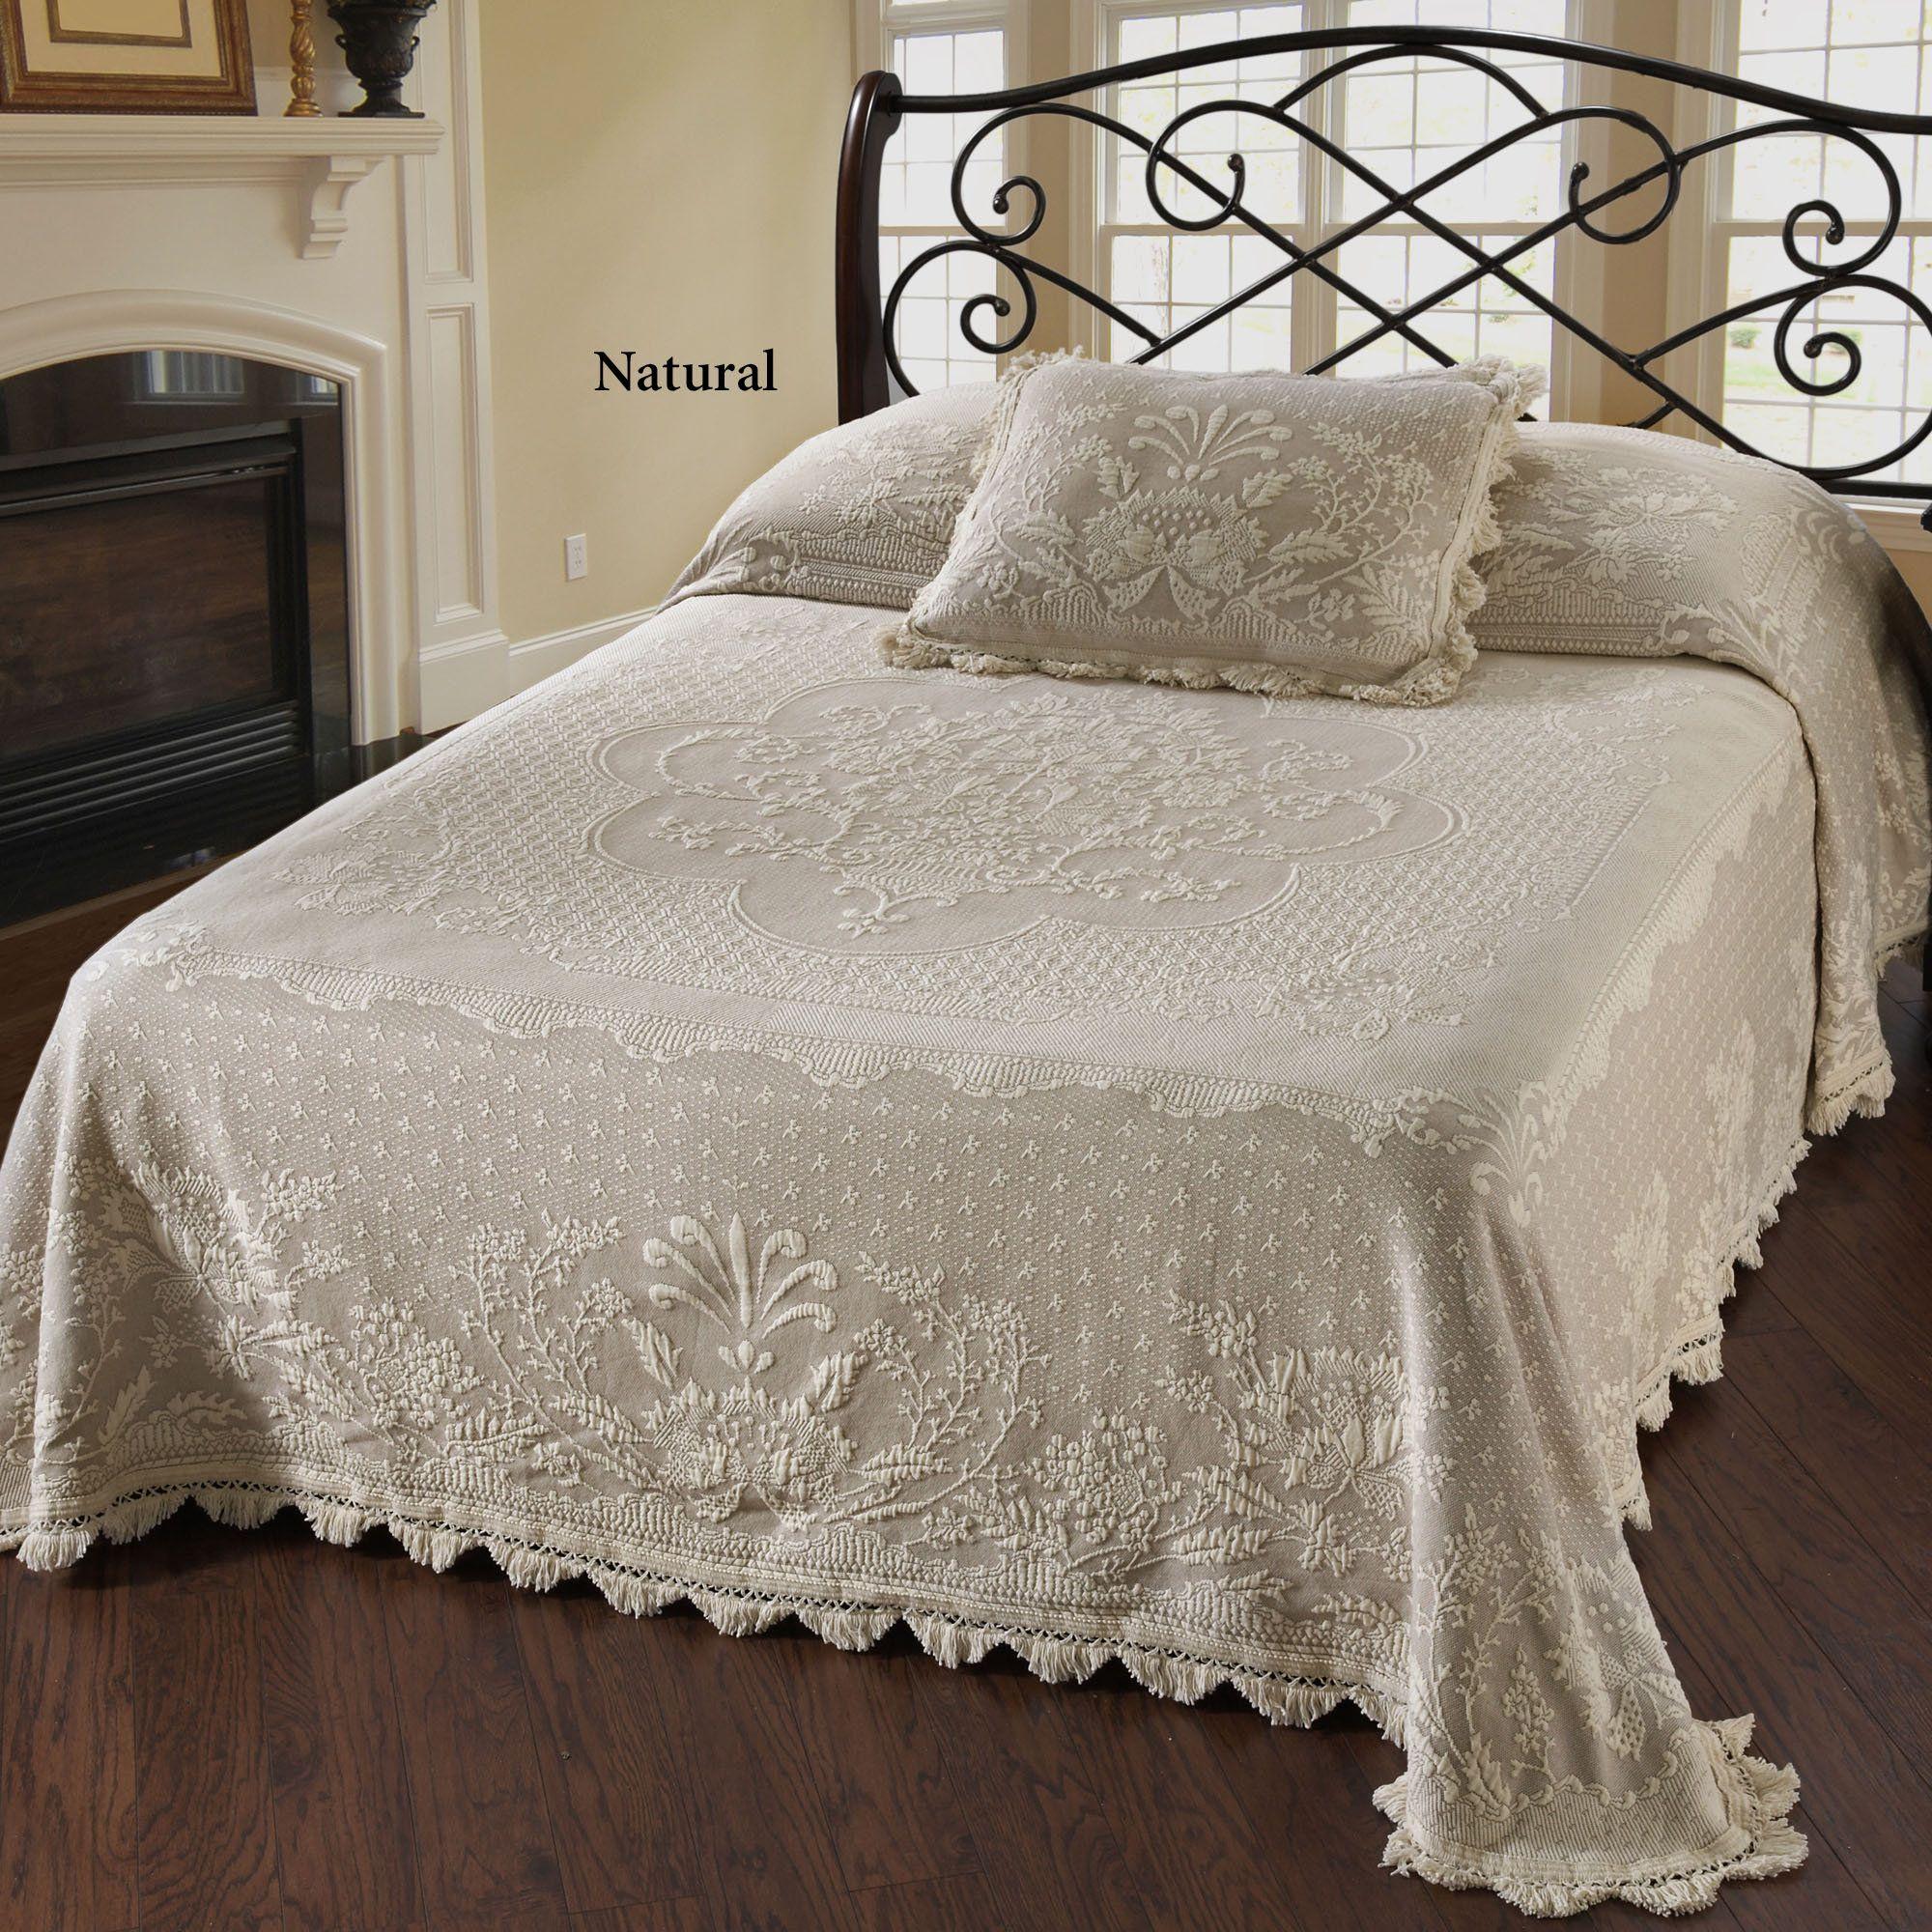 Abigail Adams Woven Matelasse Bedspread Bedding Bed